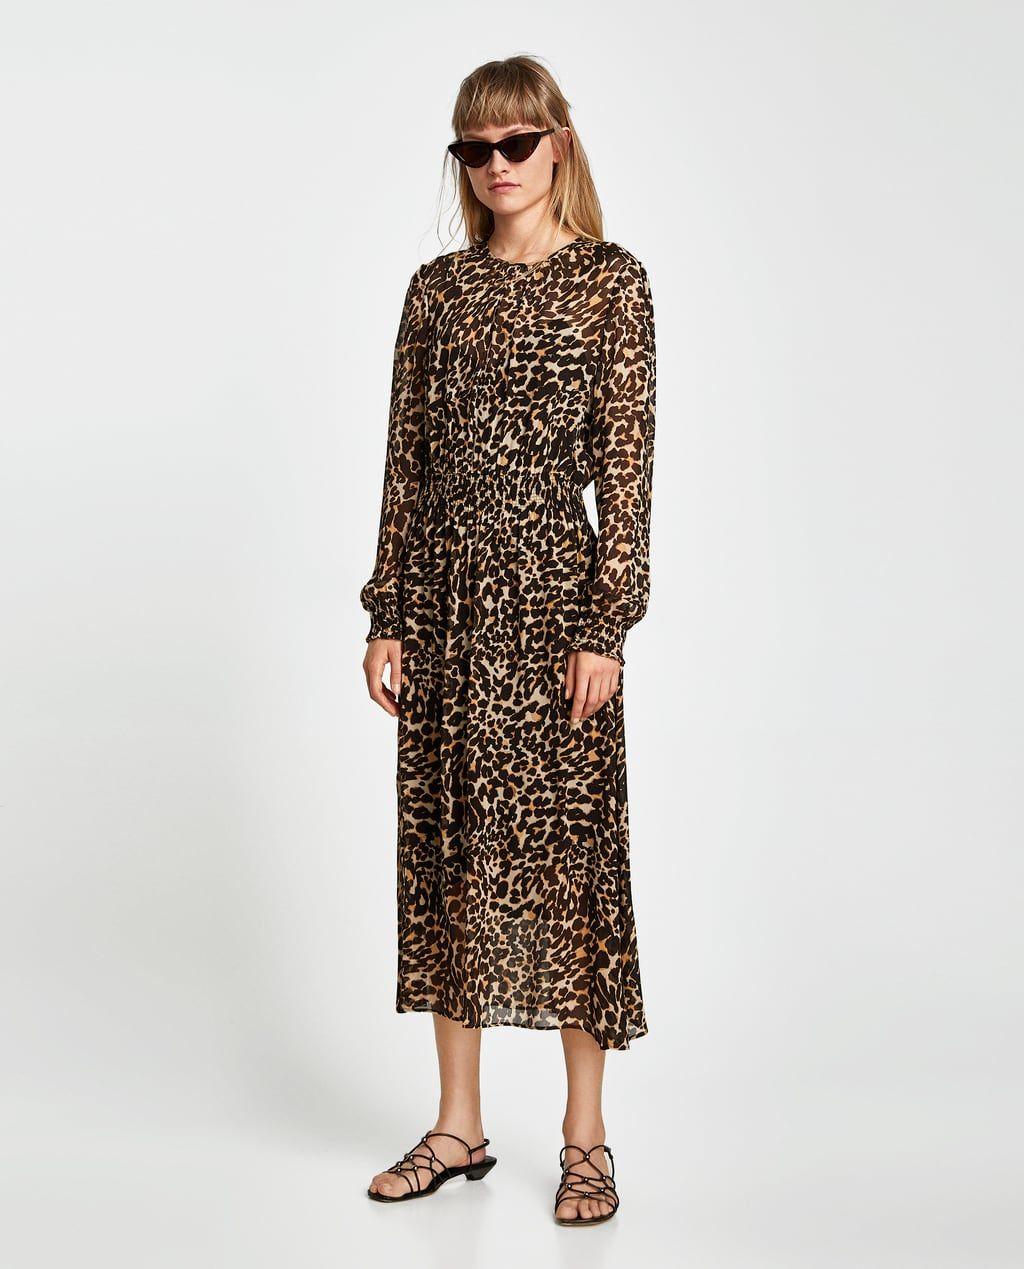 ZARA - WOMAN - ANIMAL PRINT DRESS  Kleider damen, Damenkleider